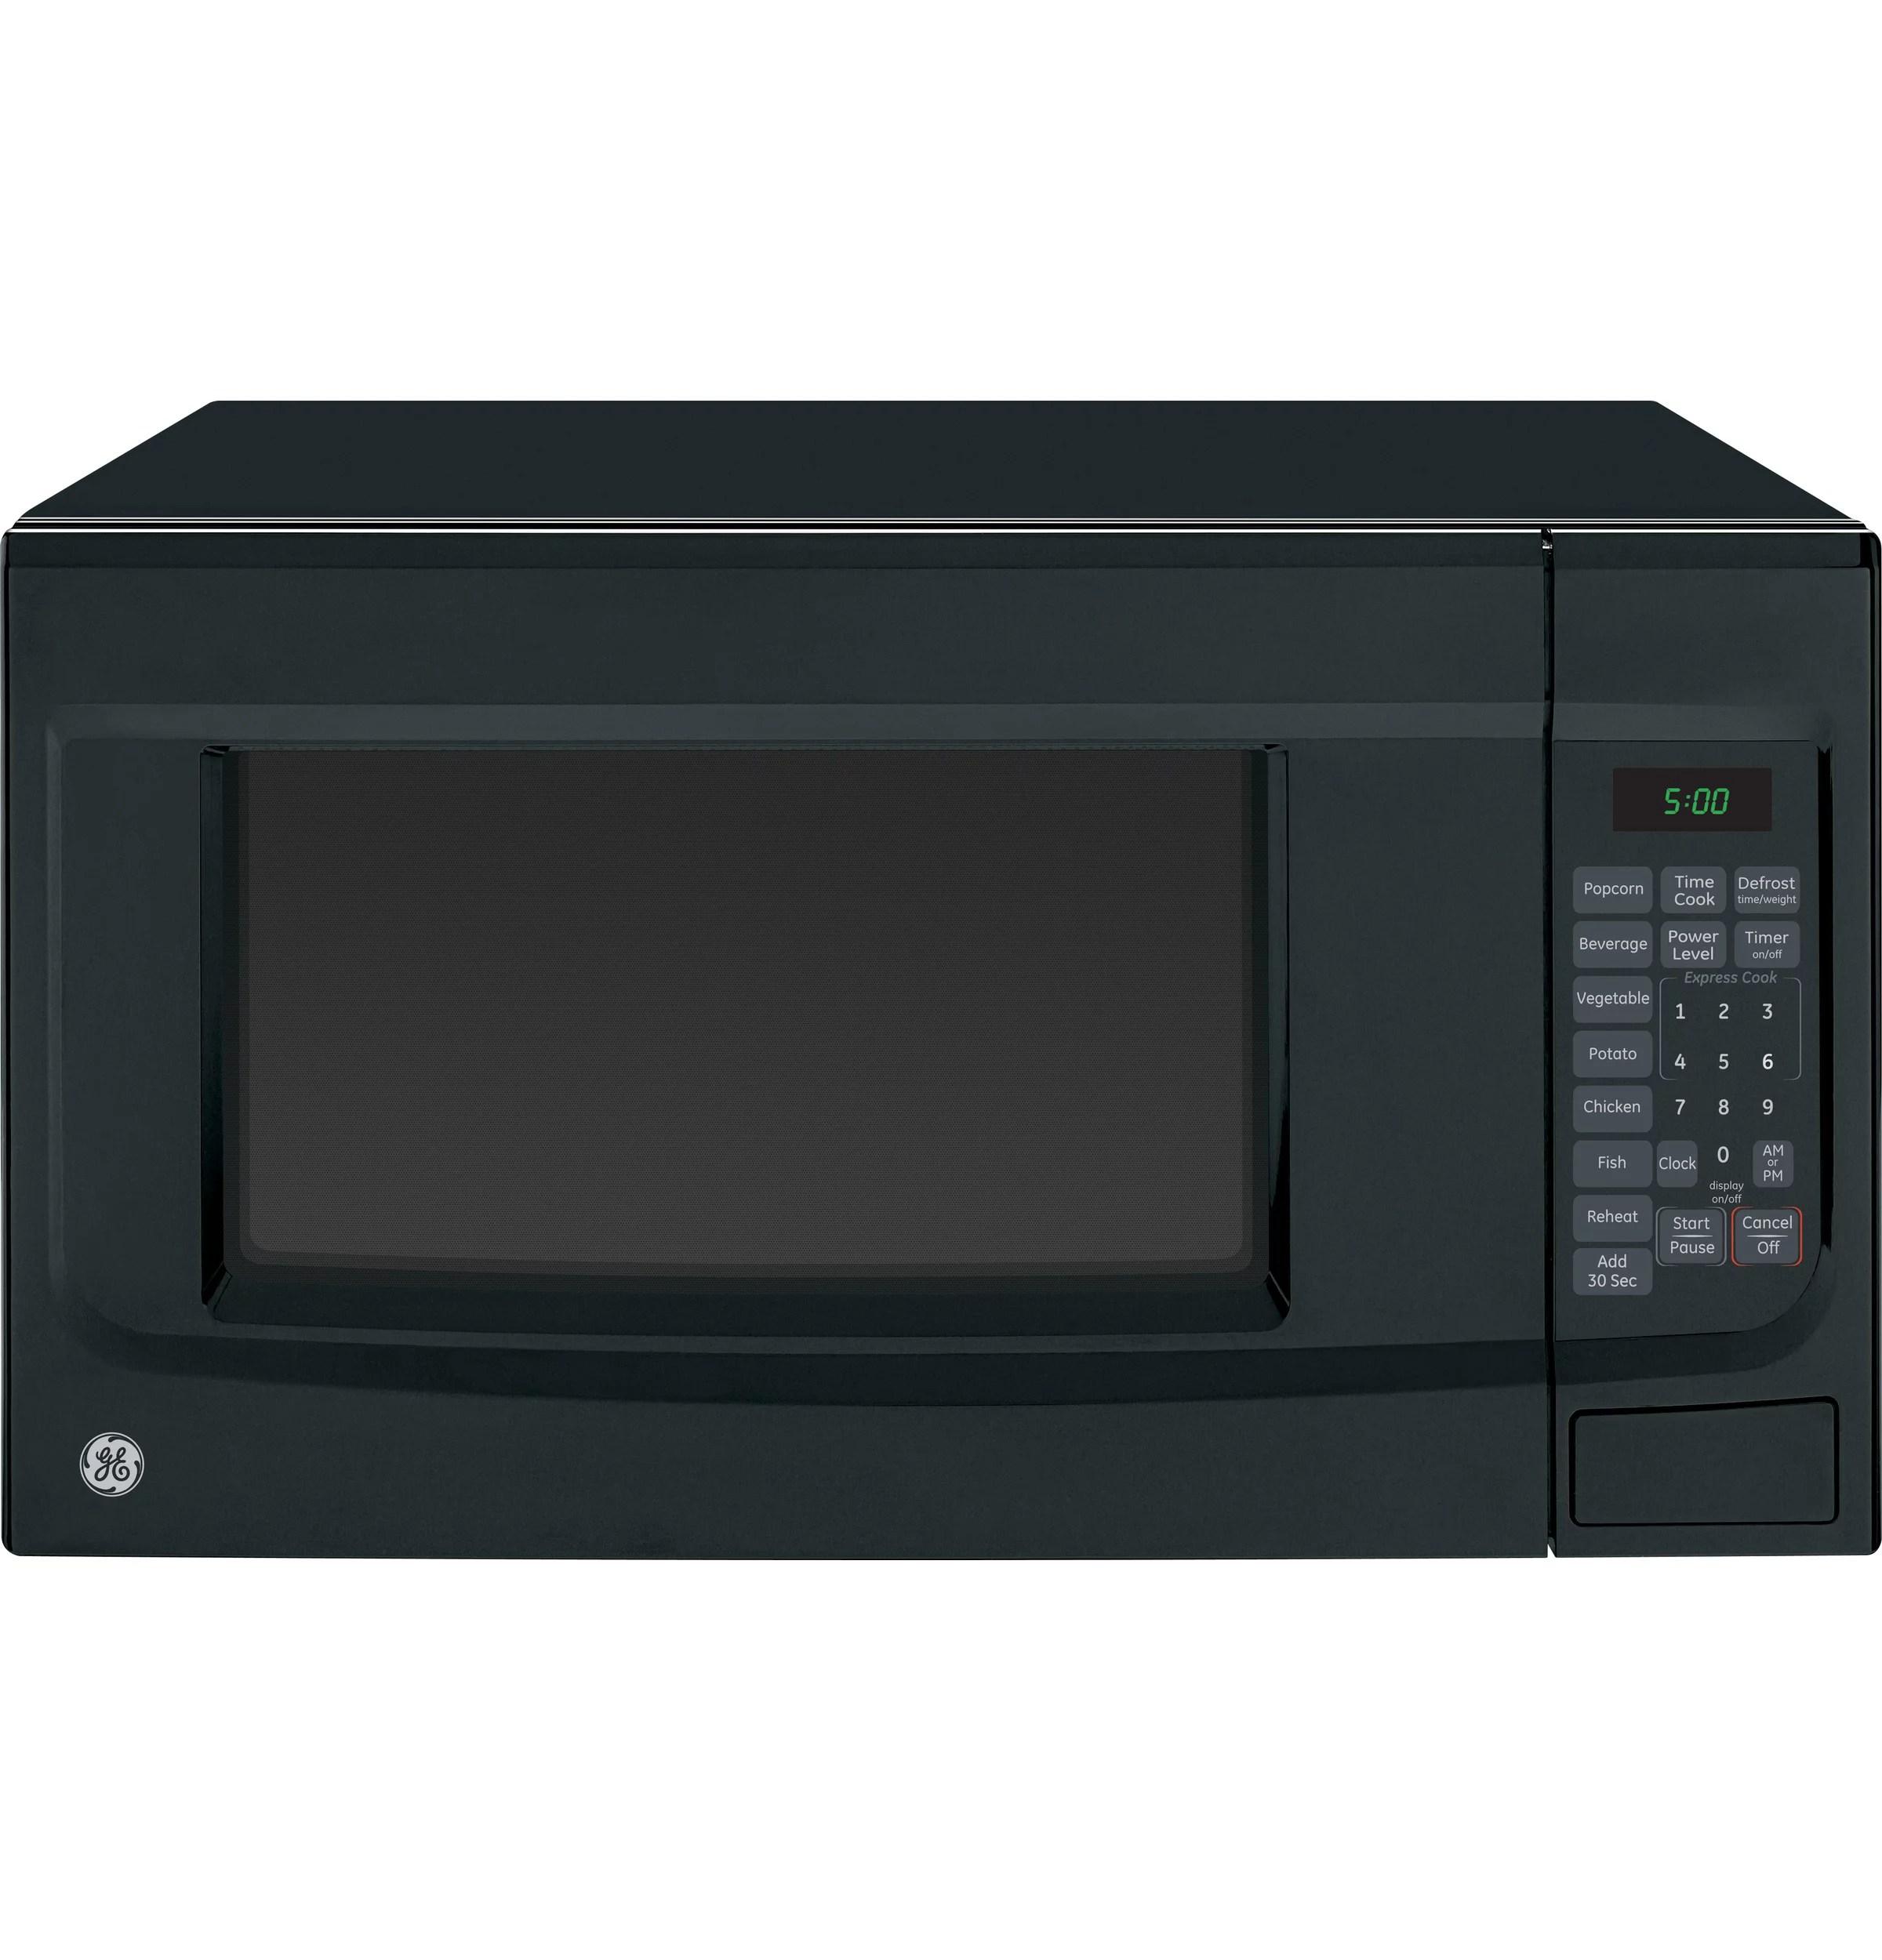 ge appliances 1 4 cubic foot countertop microwave oven black walmart com